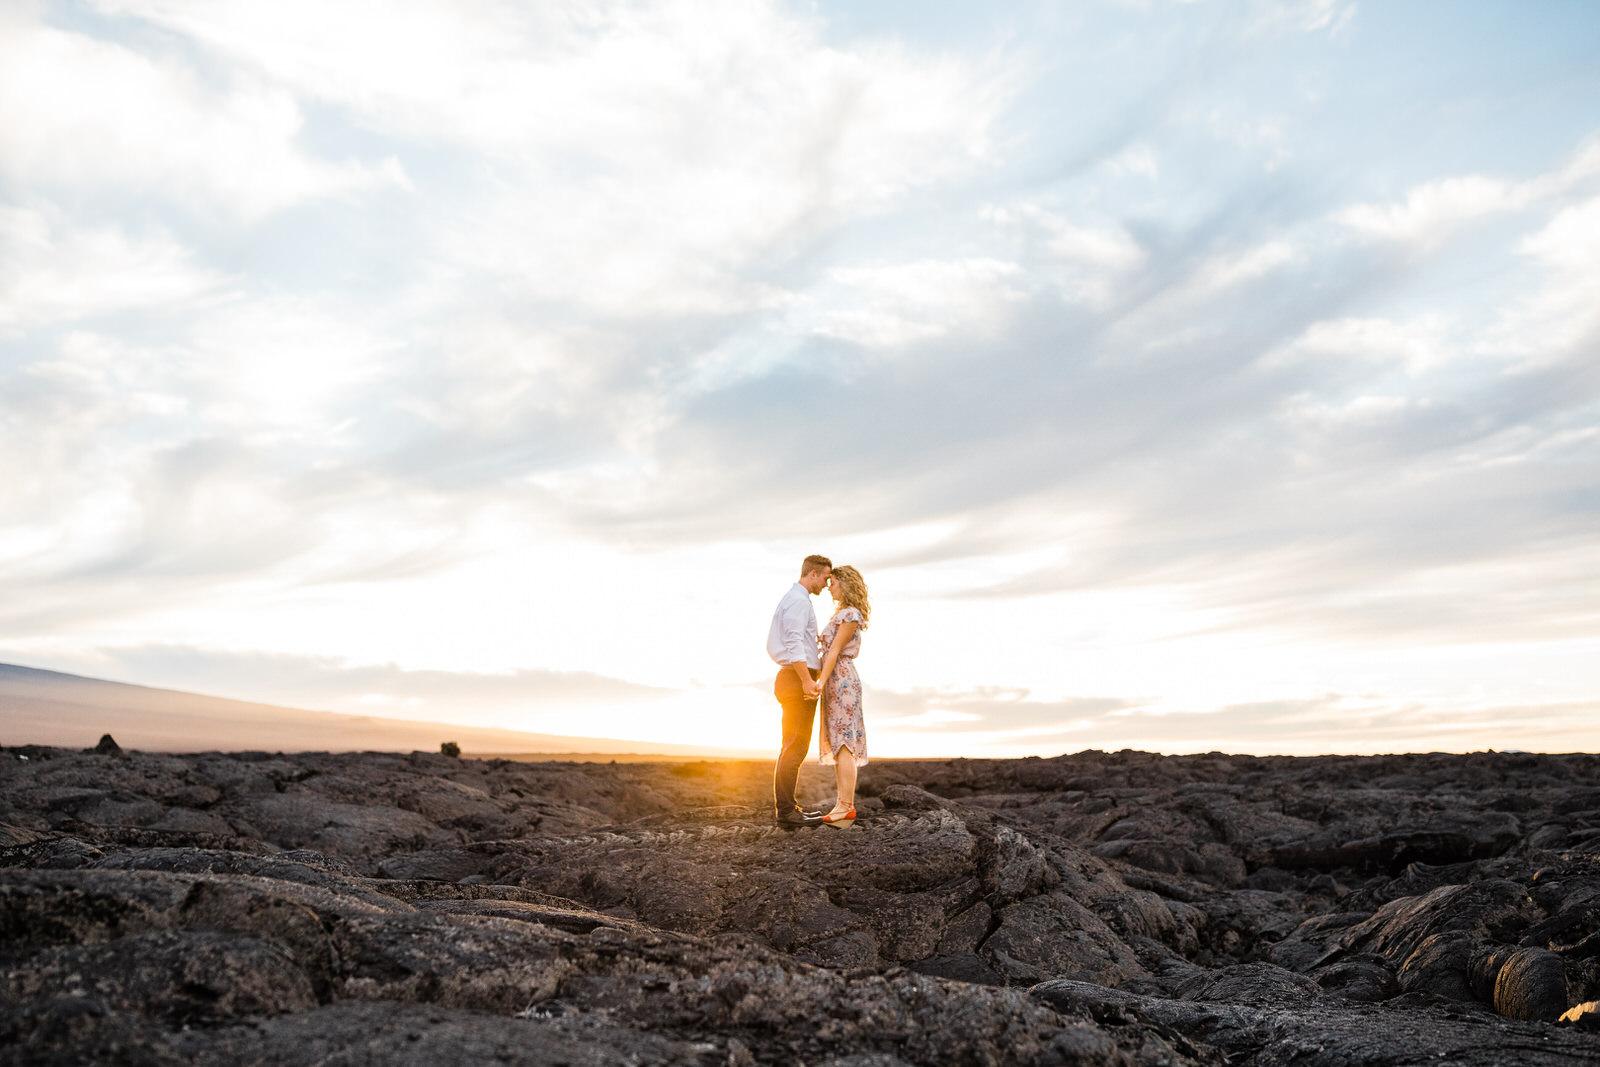 engagements-hilo-happy-couple-big-island-hawaii-14.jpg